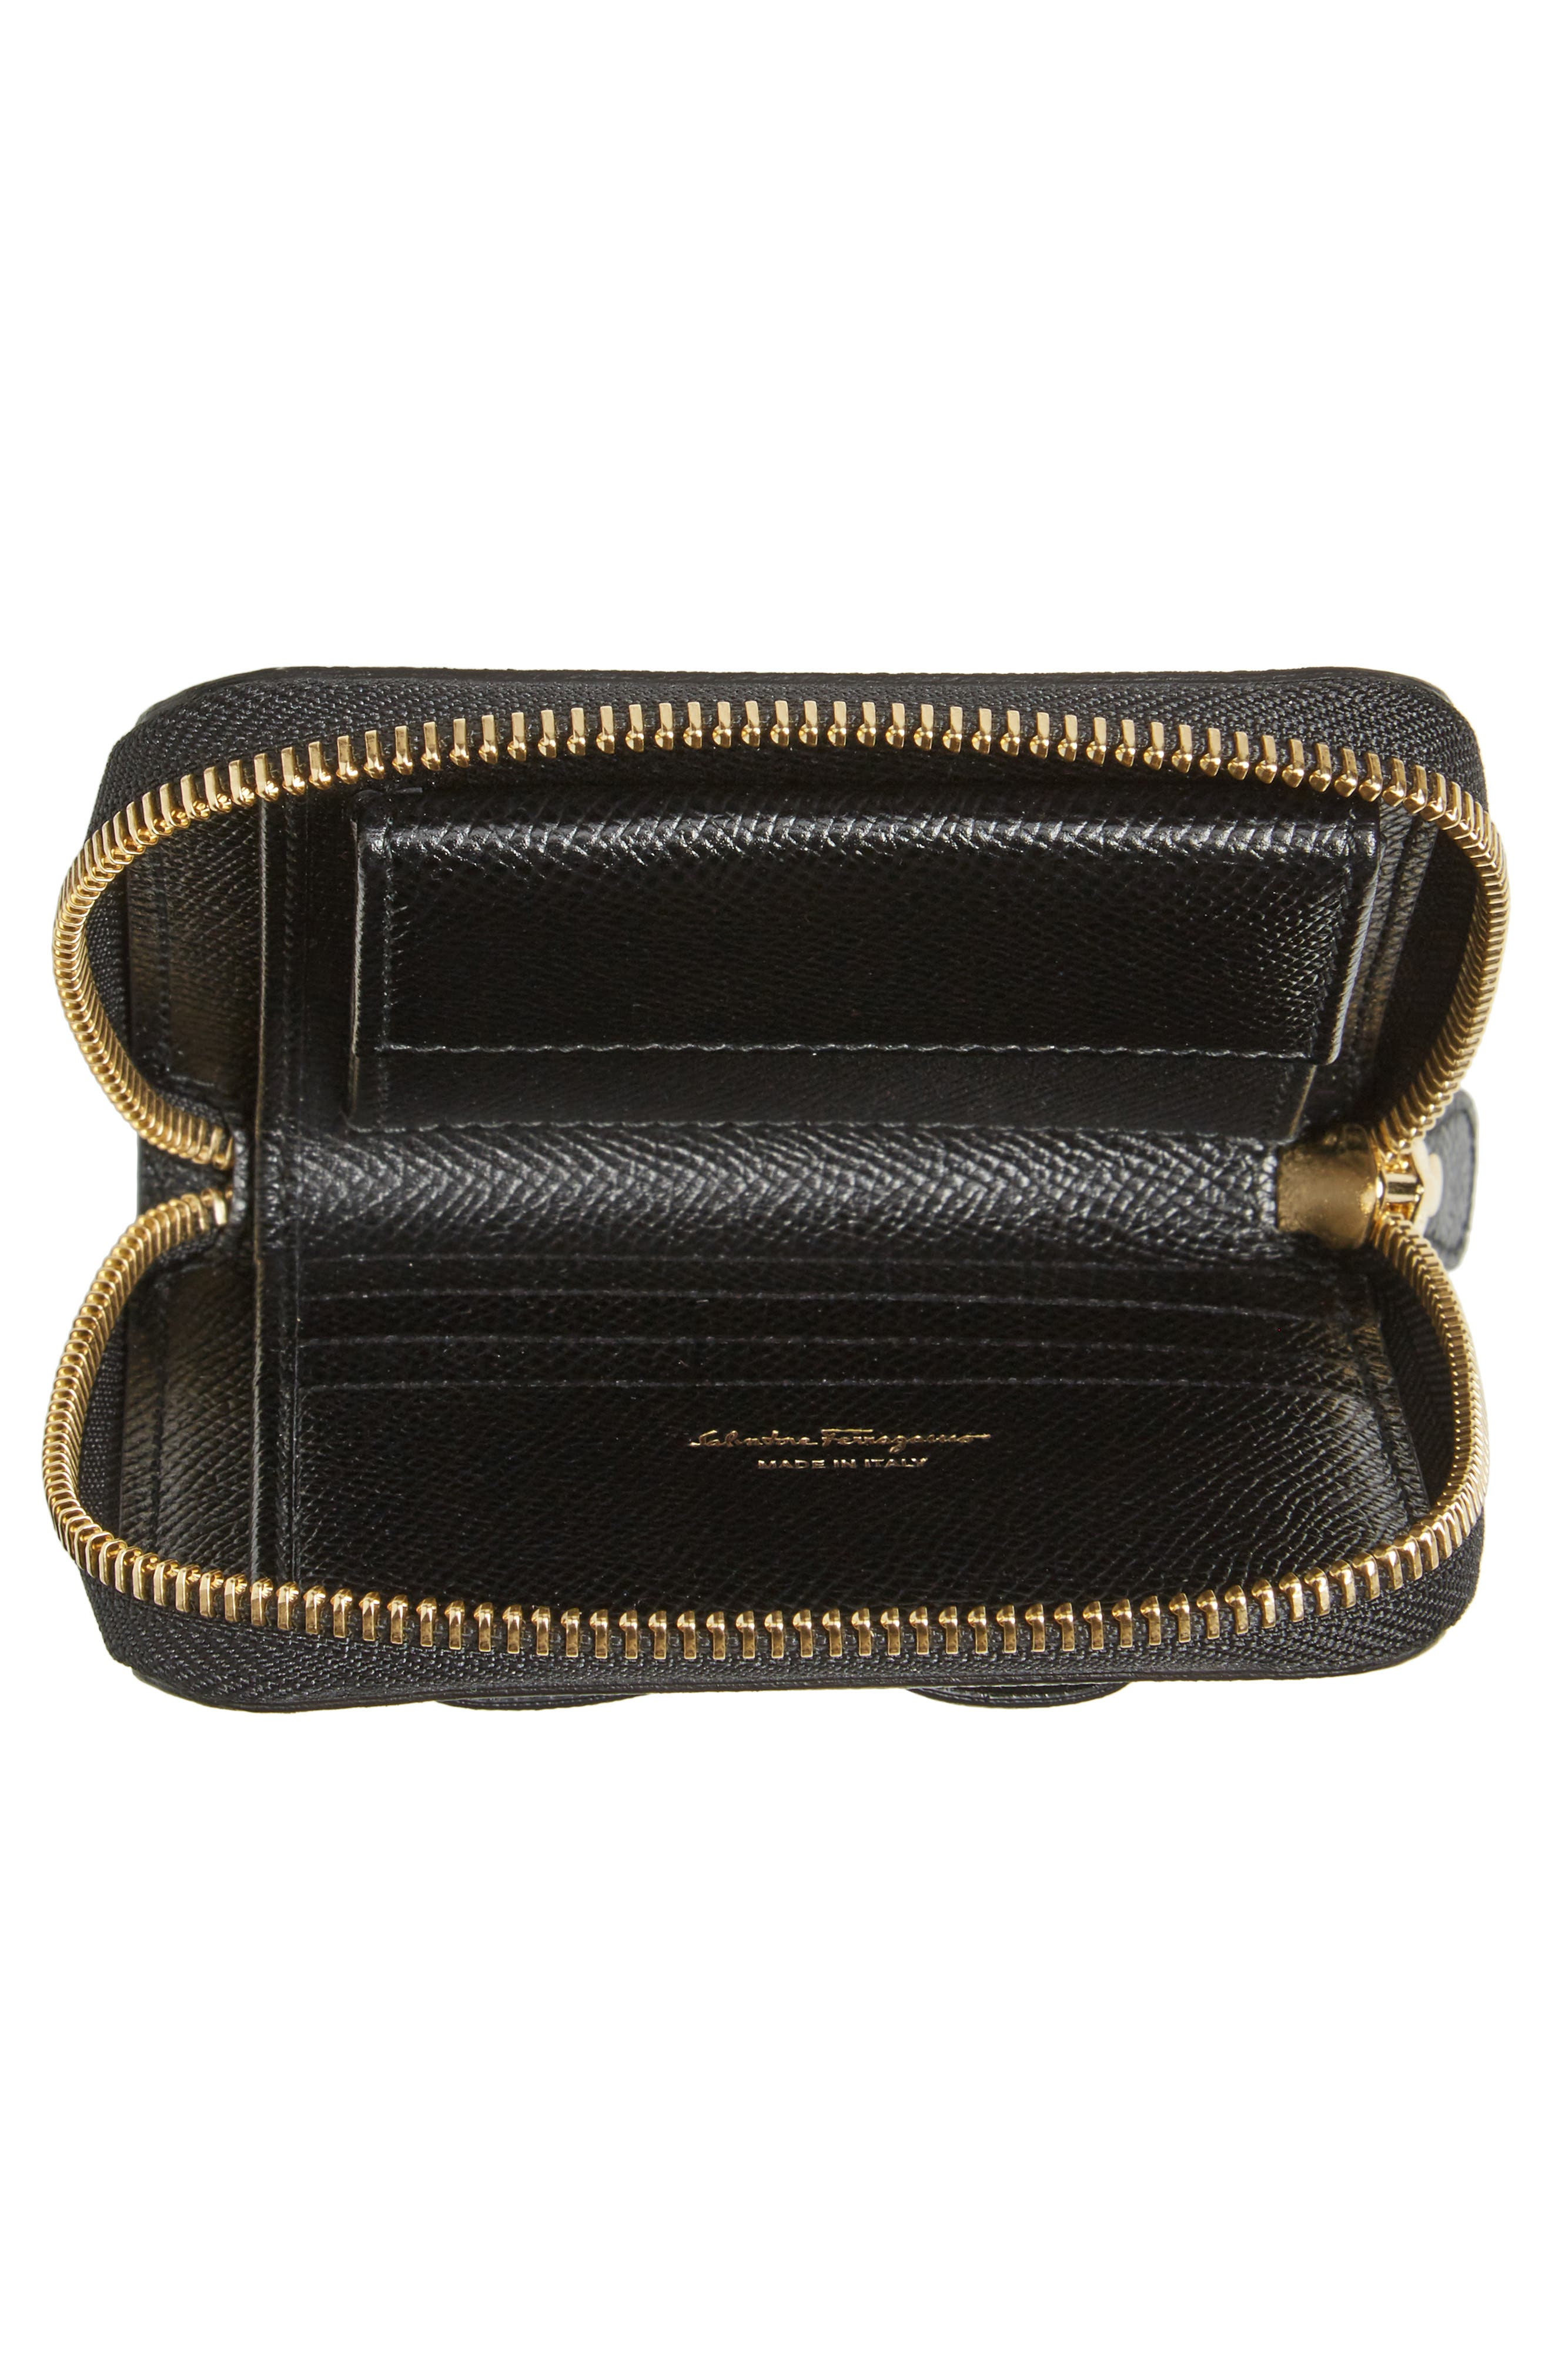 Vara Leather Zip Around French Wallet,                             Alternate thumbnail 3, color,                             Nero